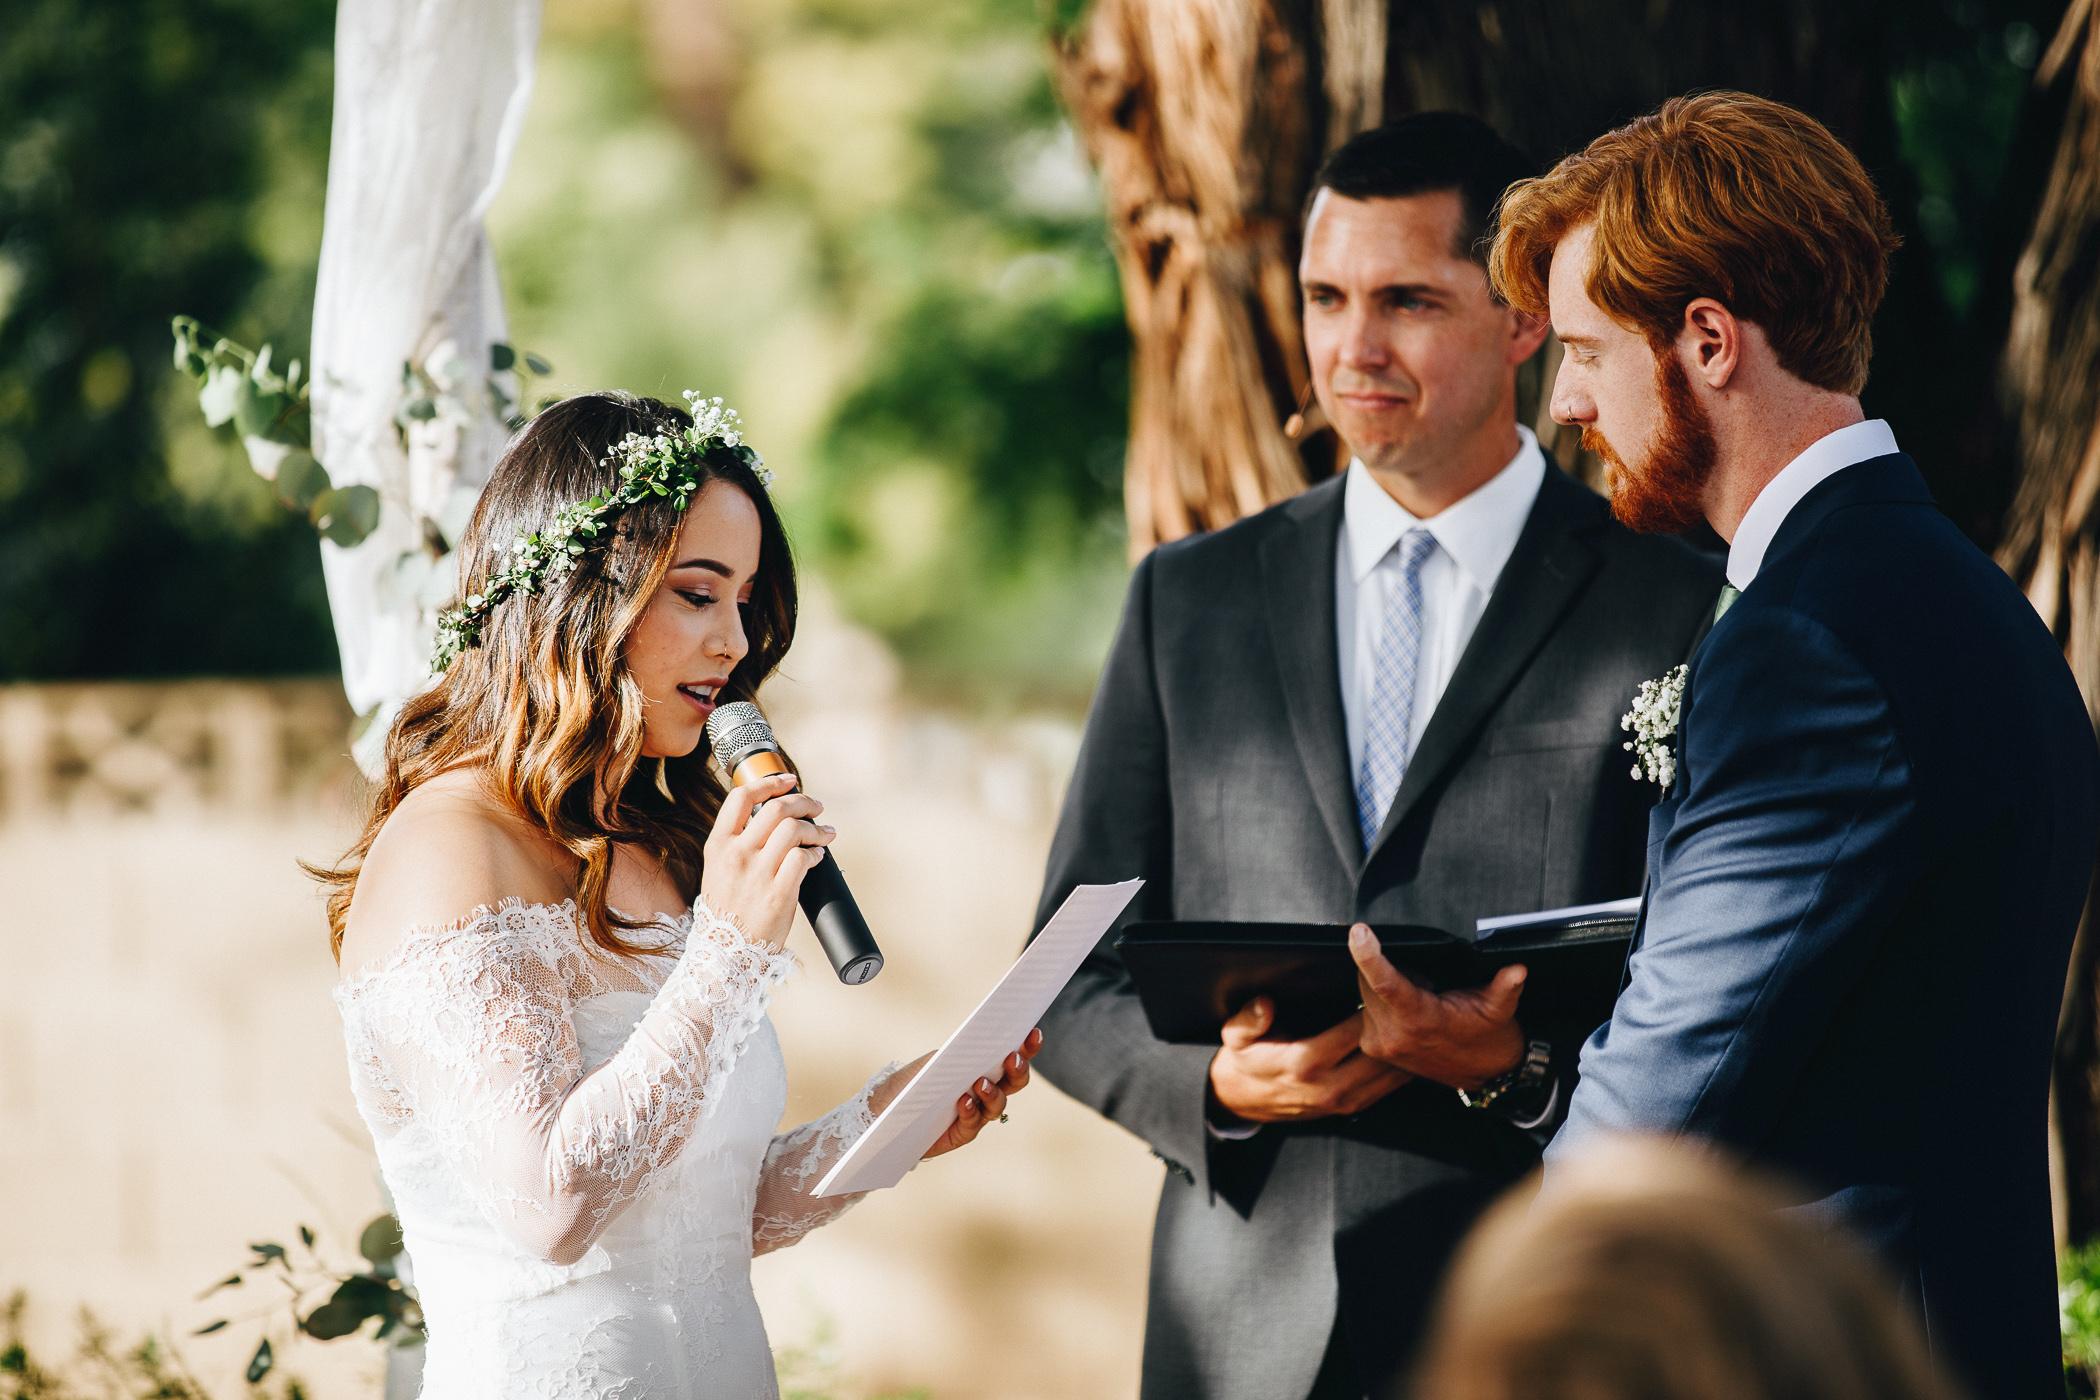 181104-Luxium-Weddings-Arizona-@matt__Le-Brandon-Kariana-Phoenix-Valley-Garden-Center-1065.jpg